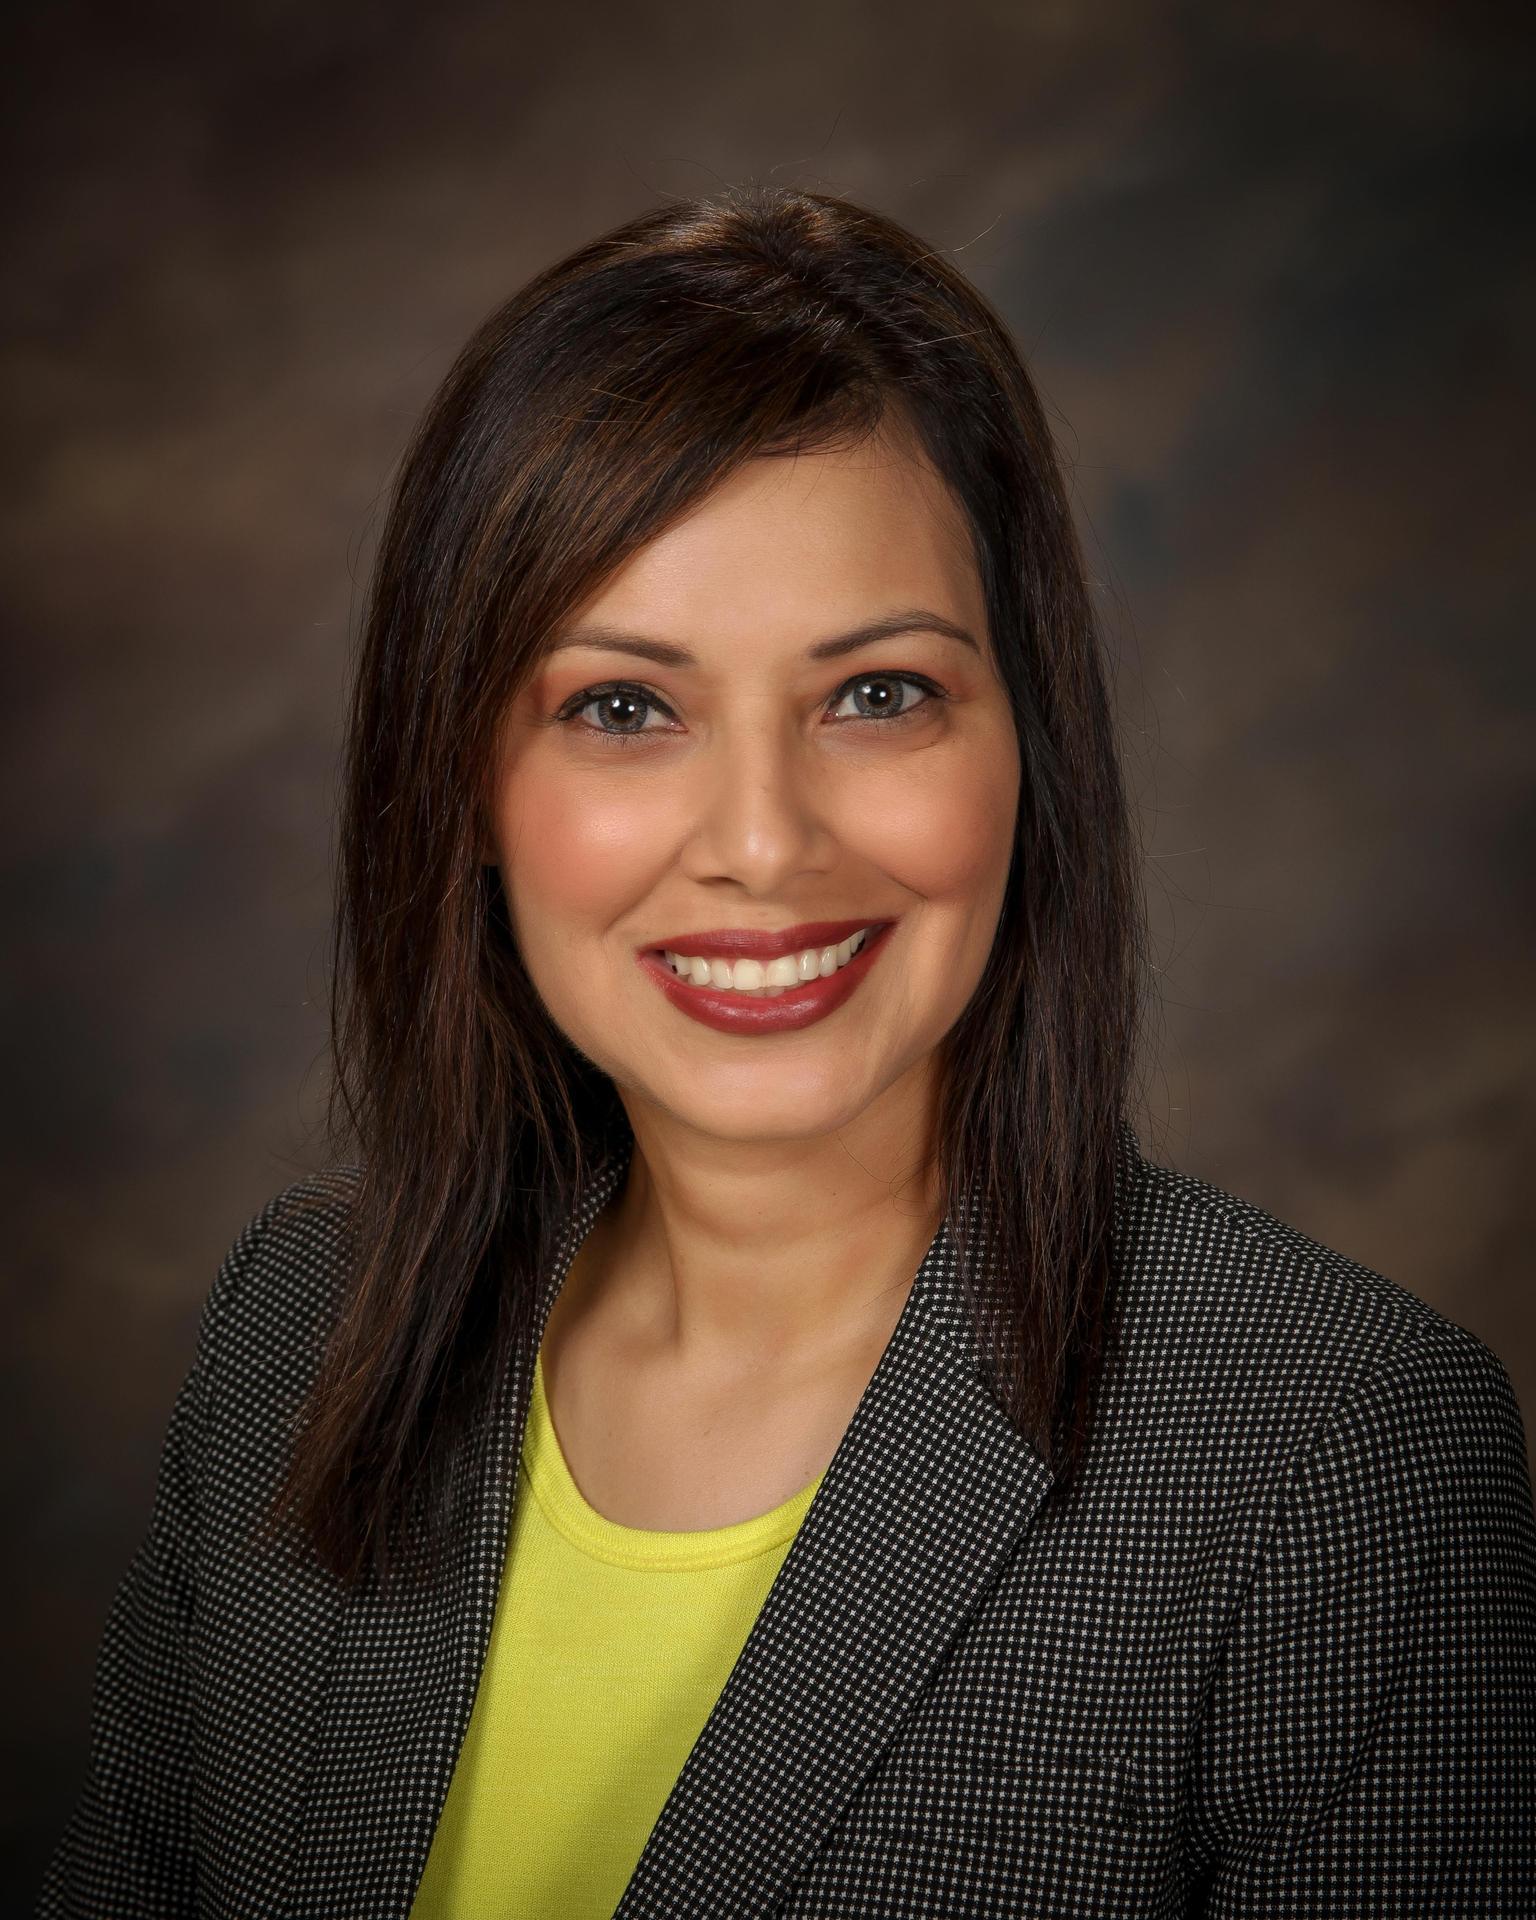 Lisa Cortez